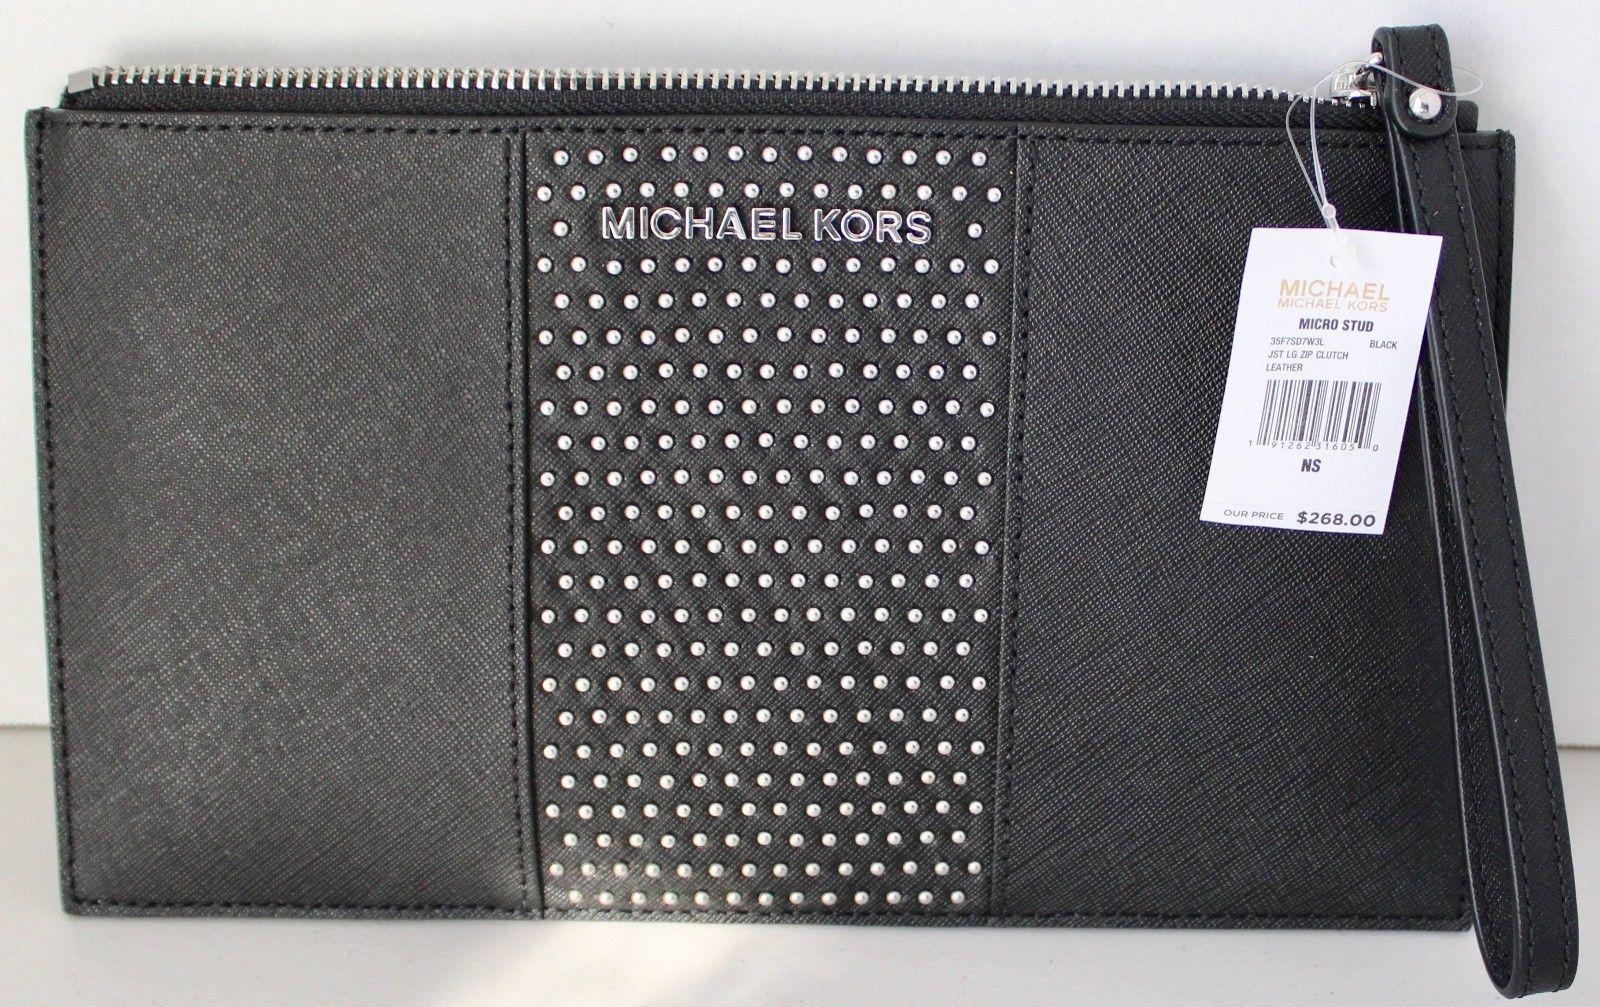 b9716c5f0e5f ... where to buy nwt michael kors saffiano jet set travel micro stud lg zip  clutchblack 14e8f